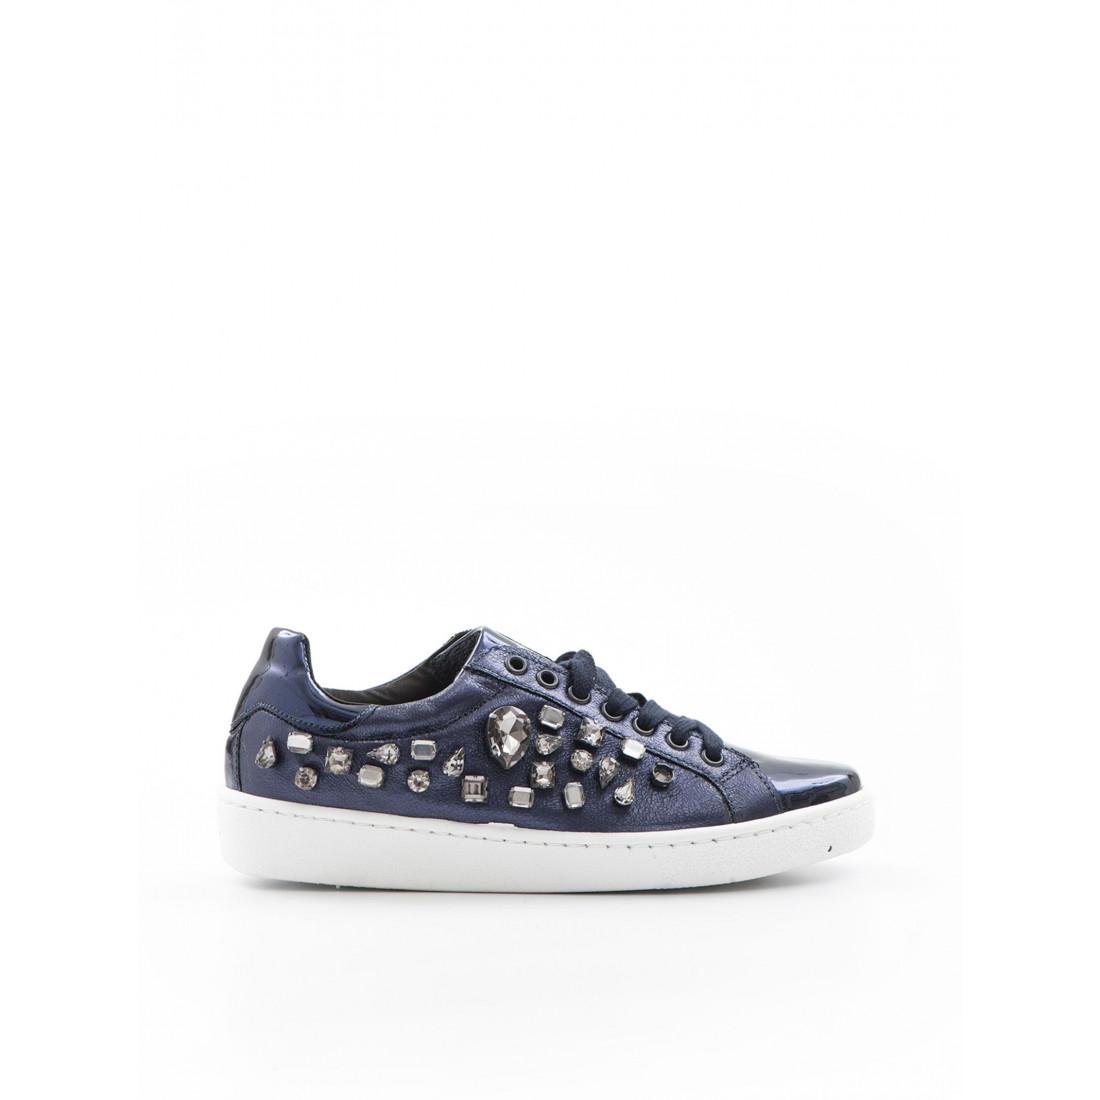 sneakers woman giulia n 1000  pietre 8 blu 957